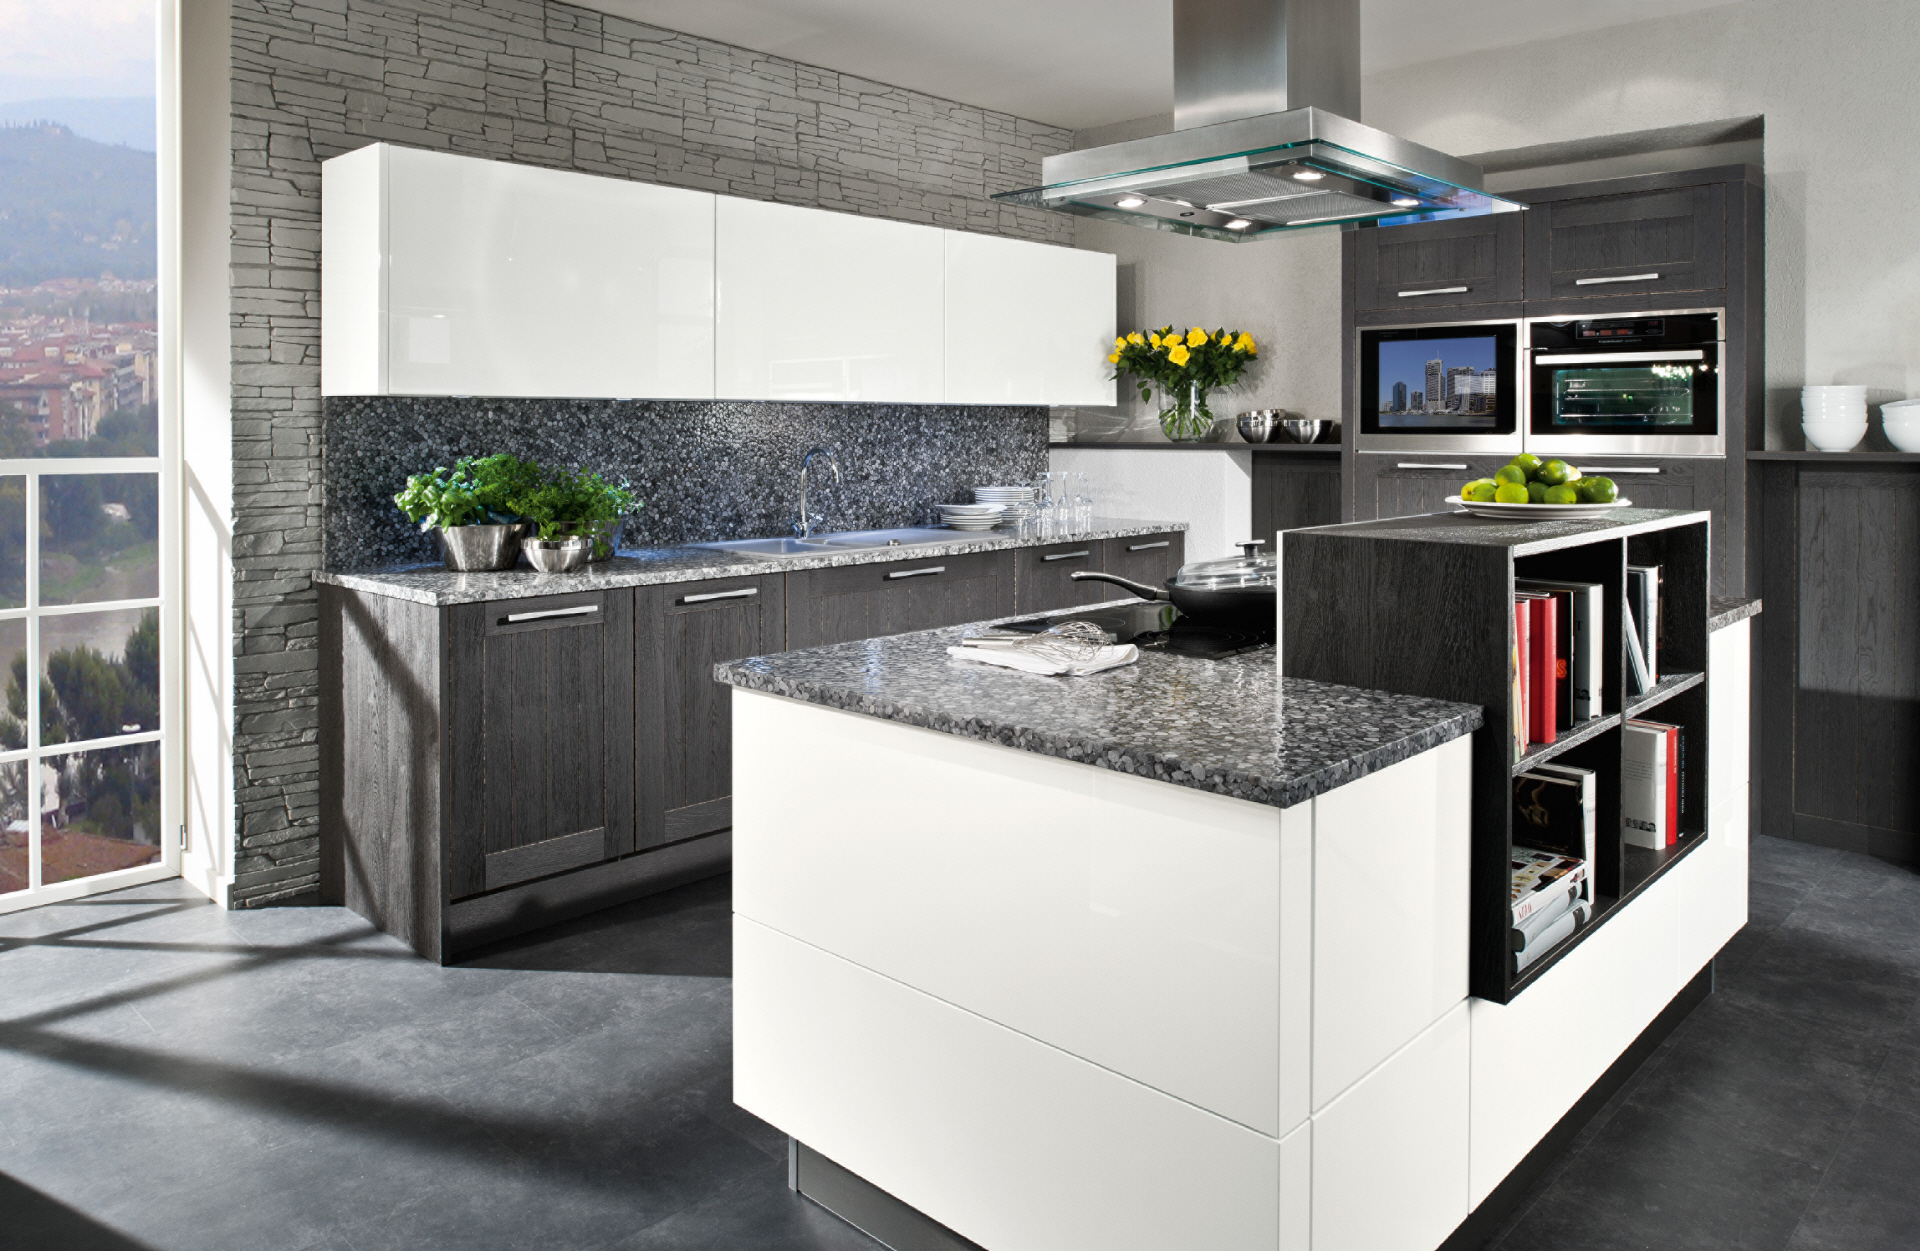 designer k chen p sentiert vom k chenprofi k chenherbert. Black Bedroom Furniture Sets. Home Design Ideas